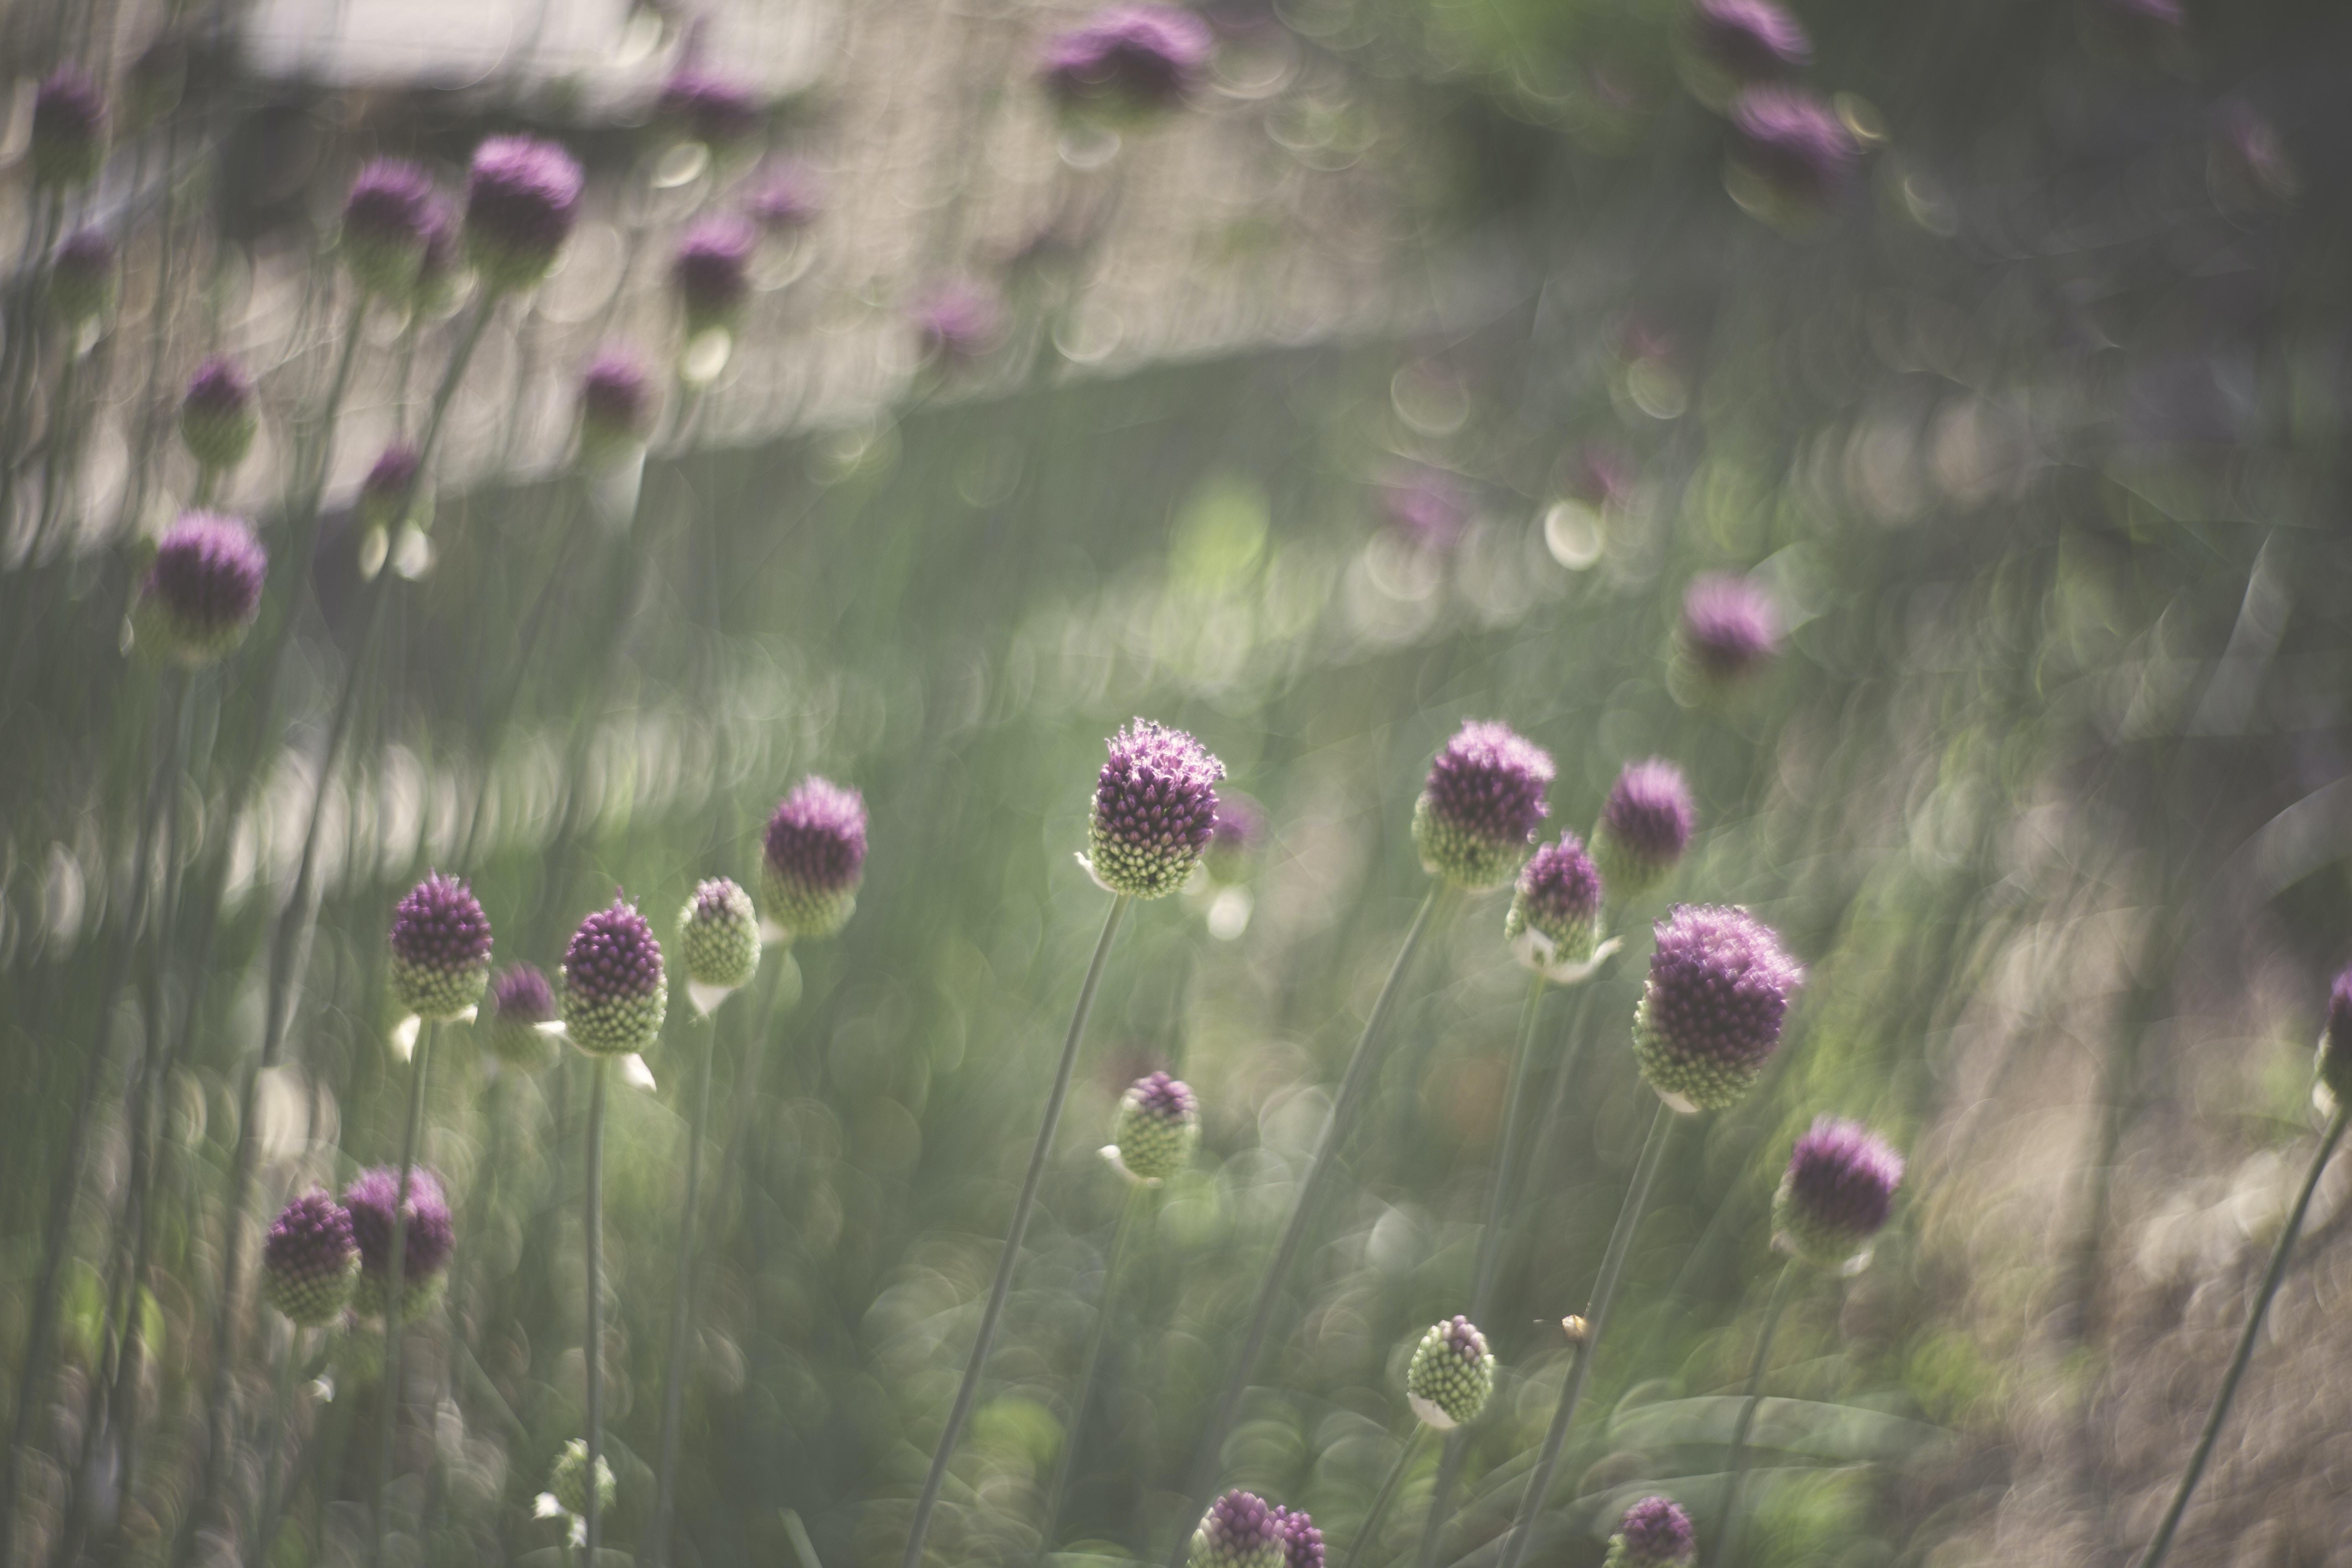 tilt shift lens photography of pink flowers